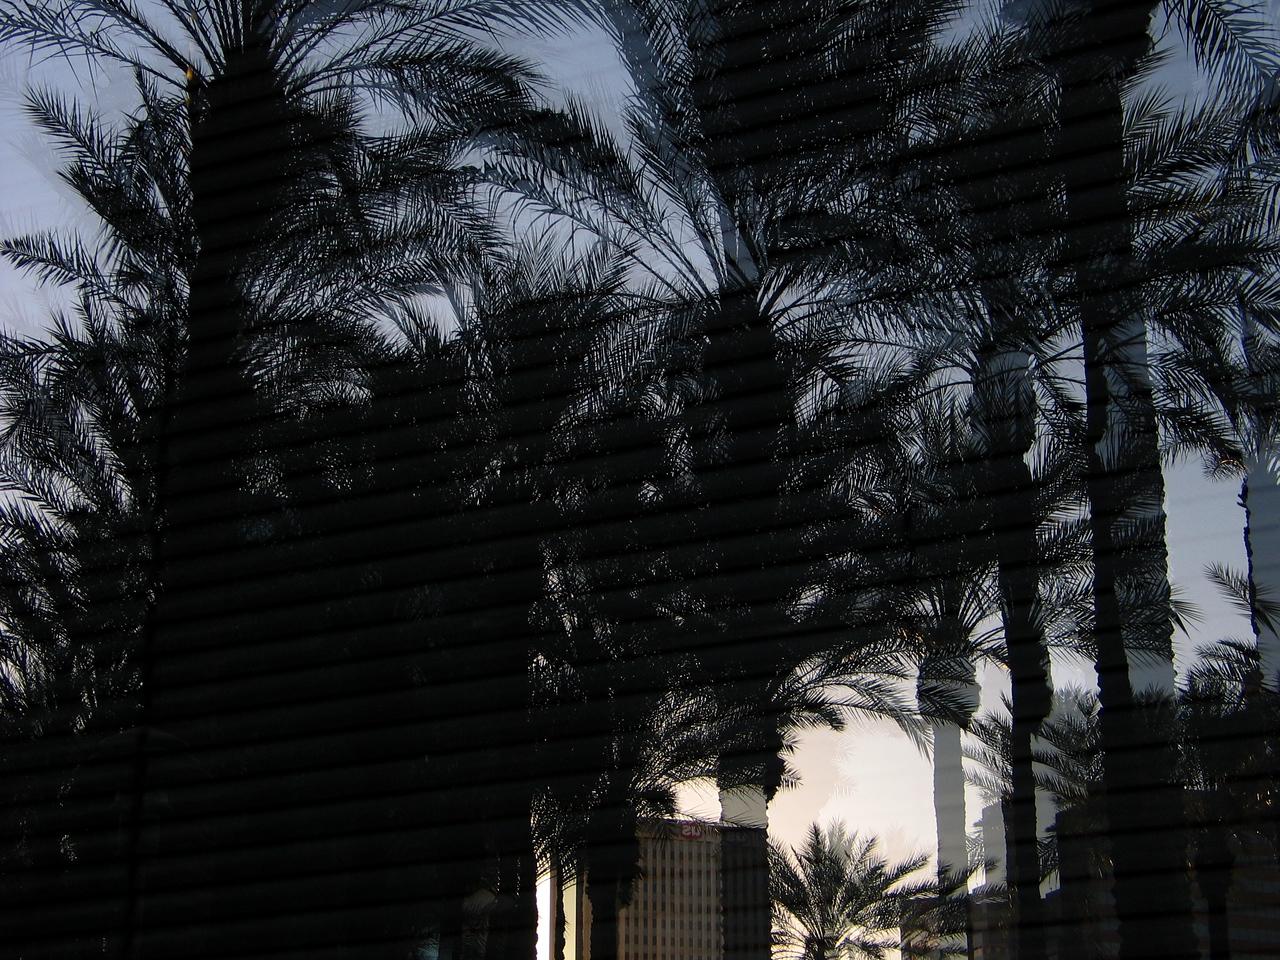 Van Vuran, Downtown Phx, February 2005